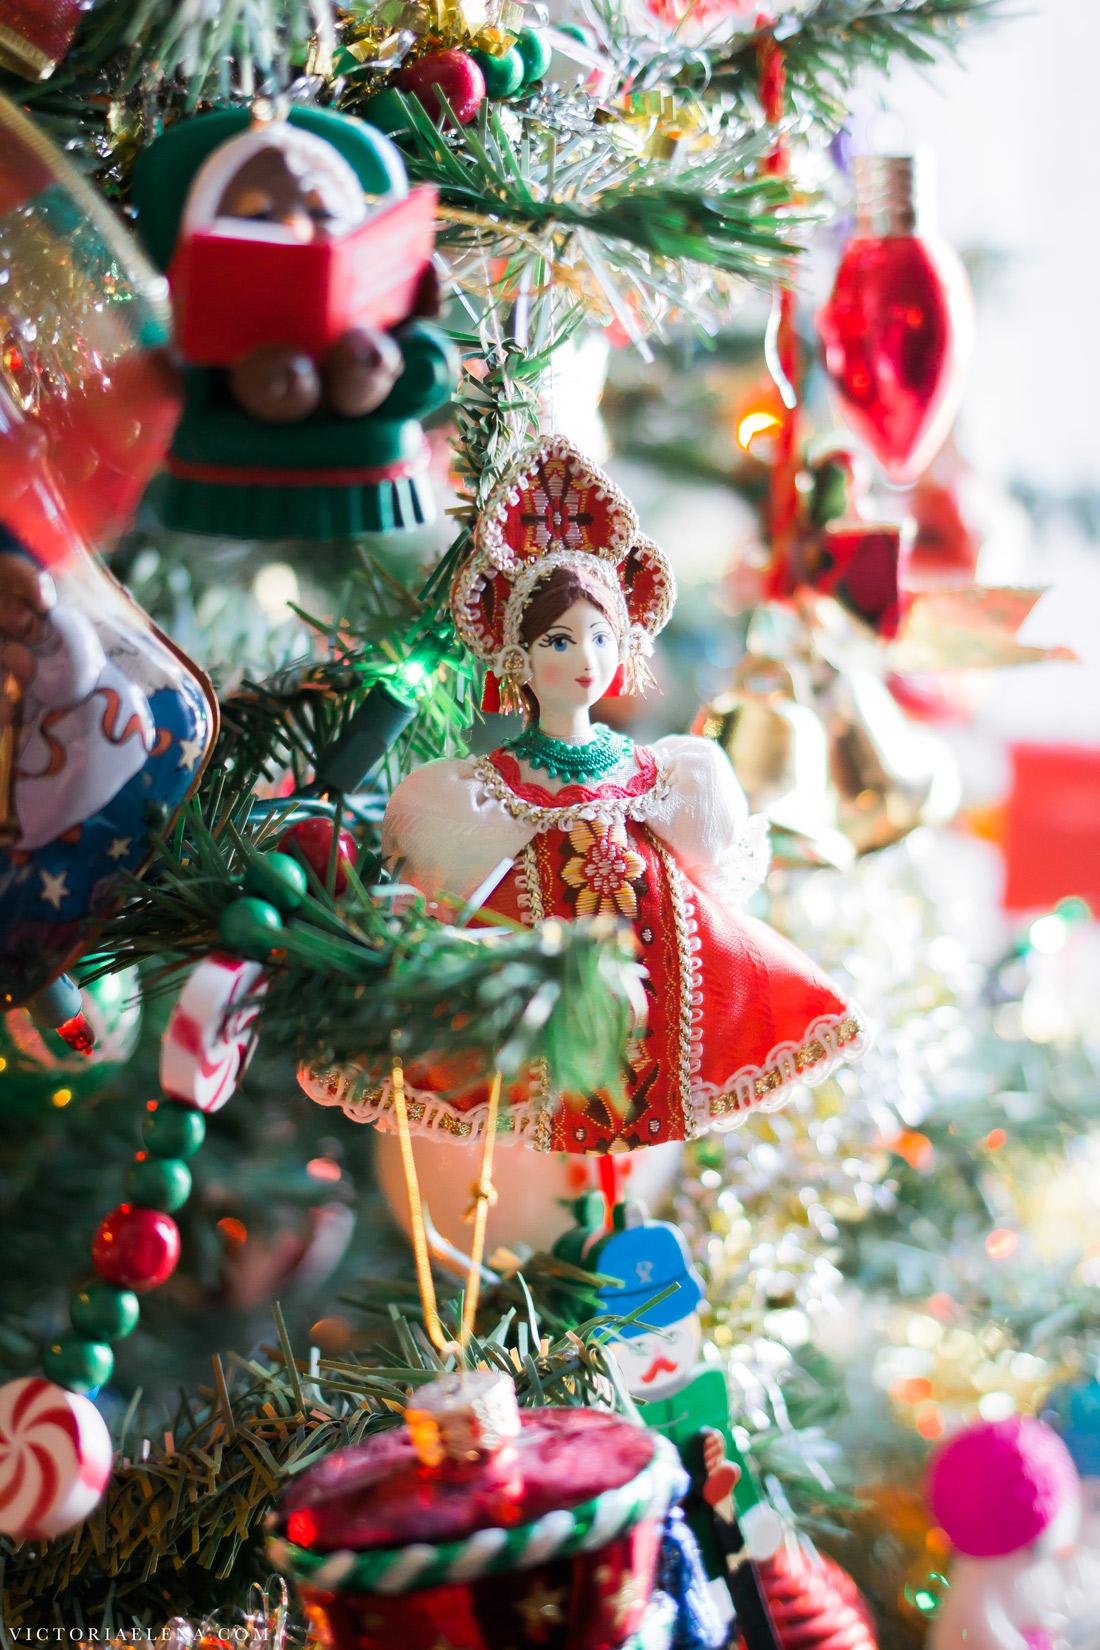 w-moms-christmas-ornaments-by-victoria-elena-24.jpg